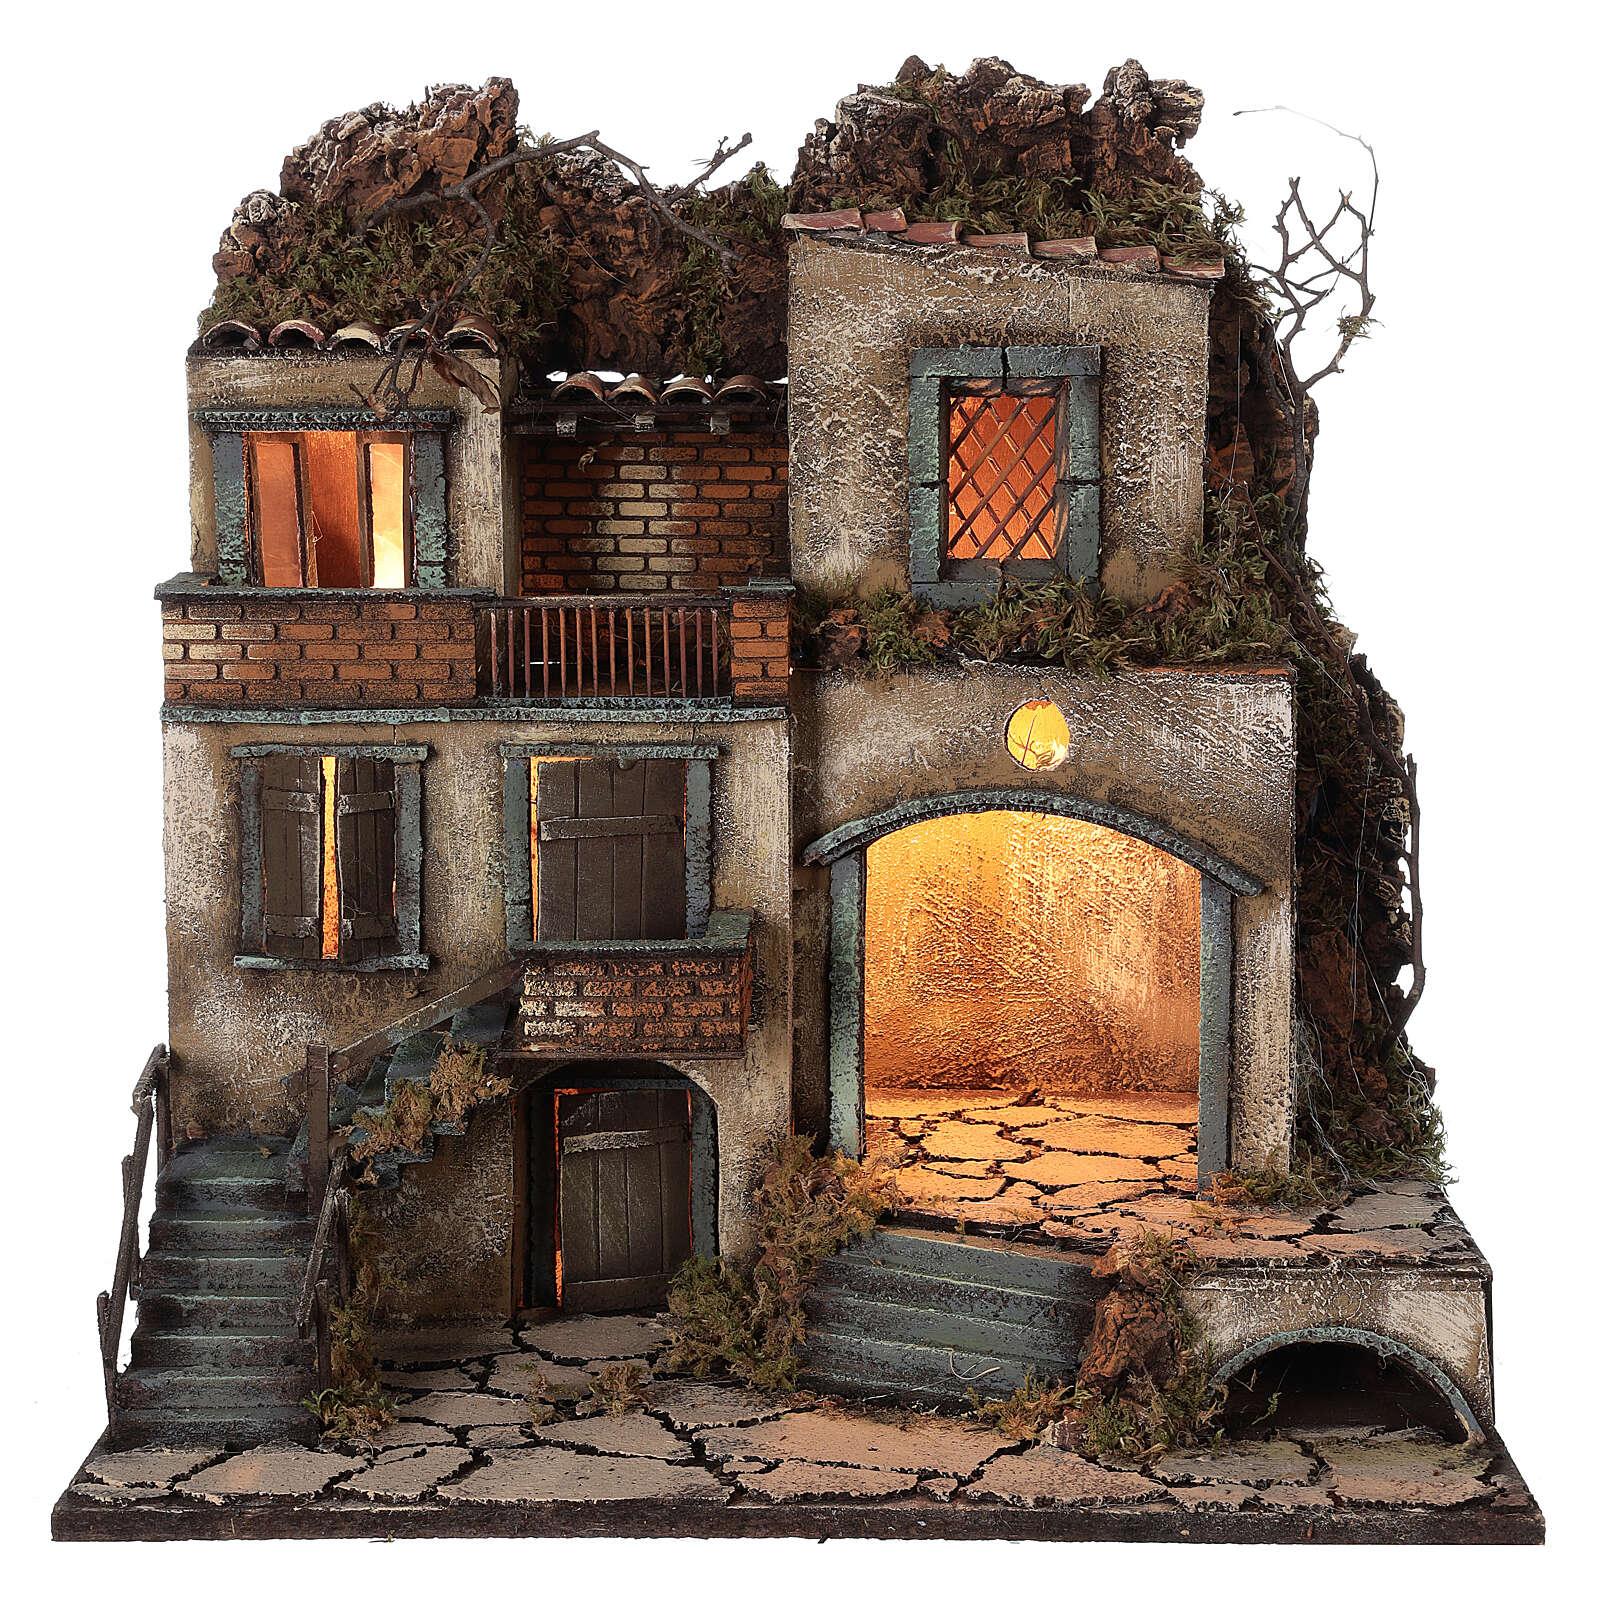 Illuminated village for Neapolitan Nativity Scene 50x50x40 cm for figurines of 10 cm average height 4